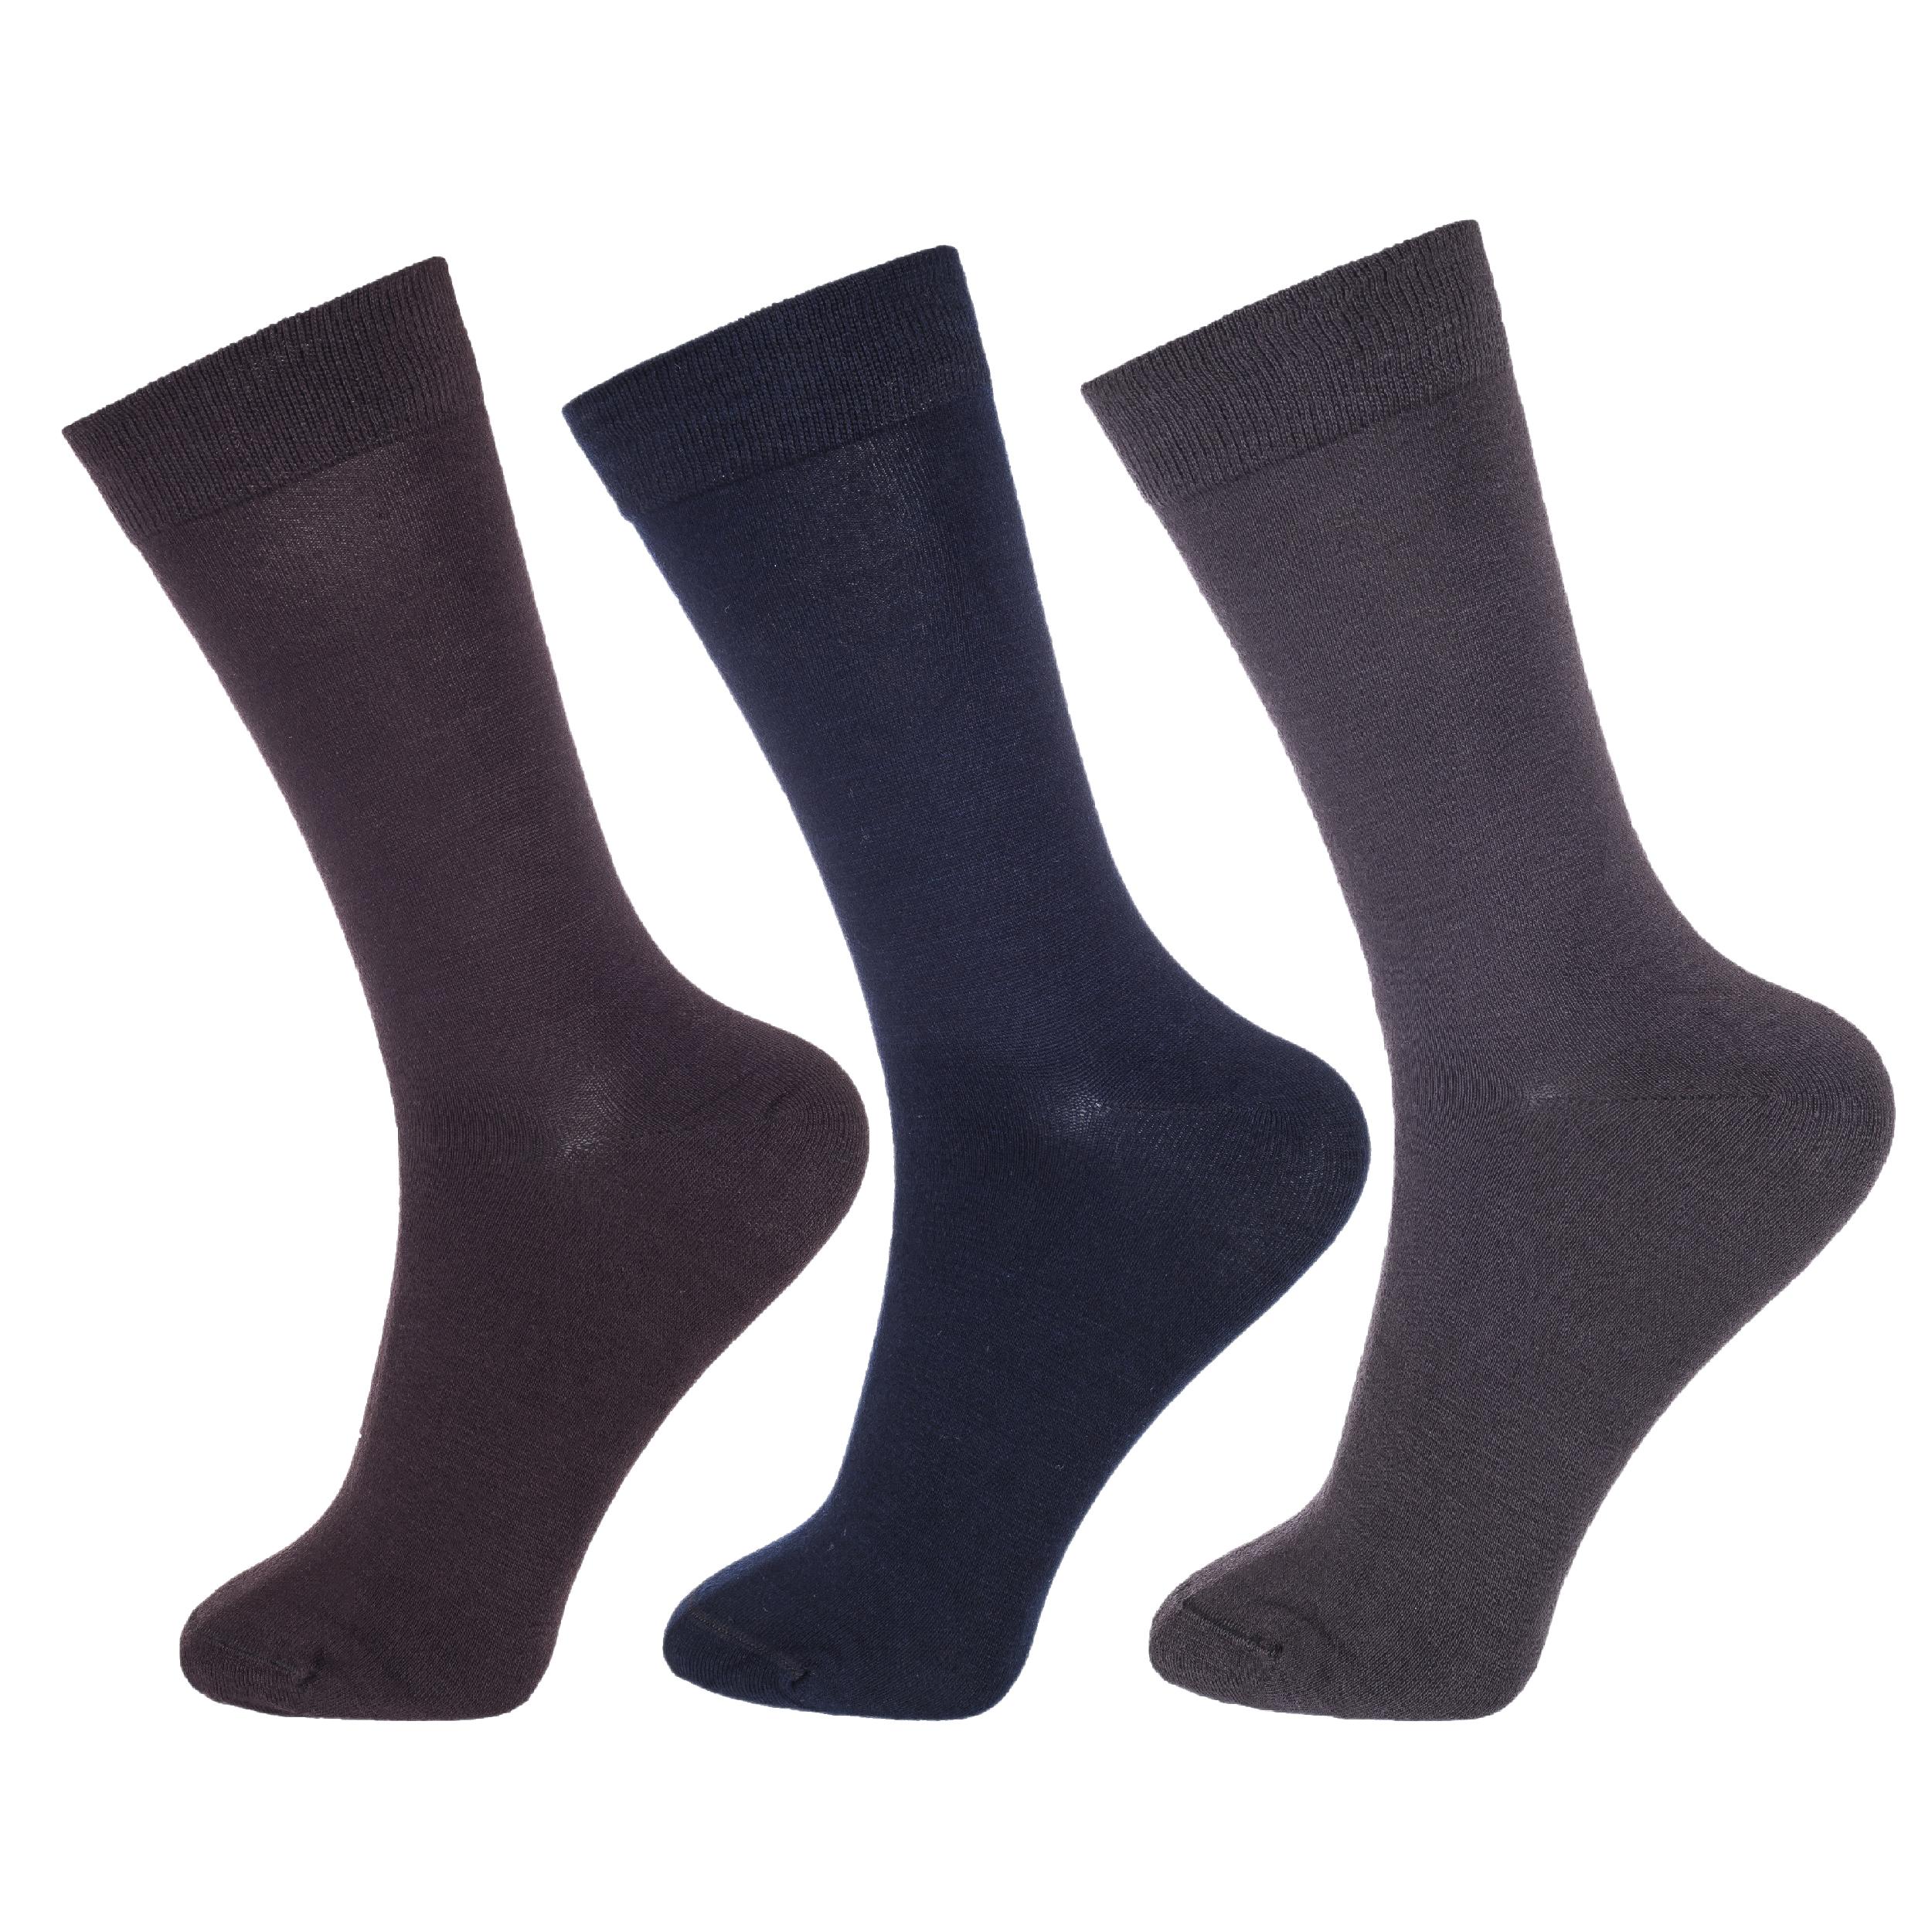 جوراب مردانه پاموک کد MPC4114 مجموعه 3 عددی